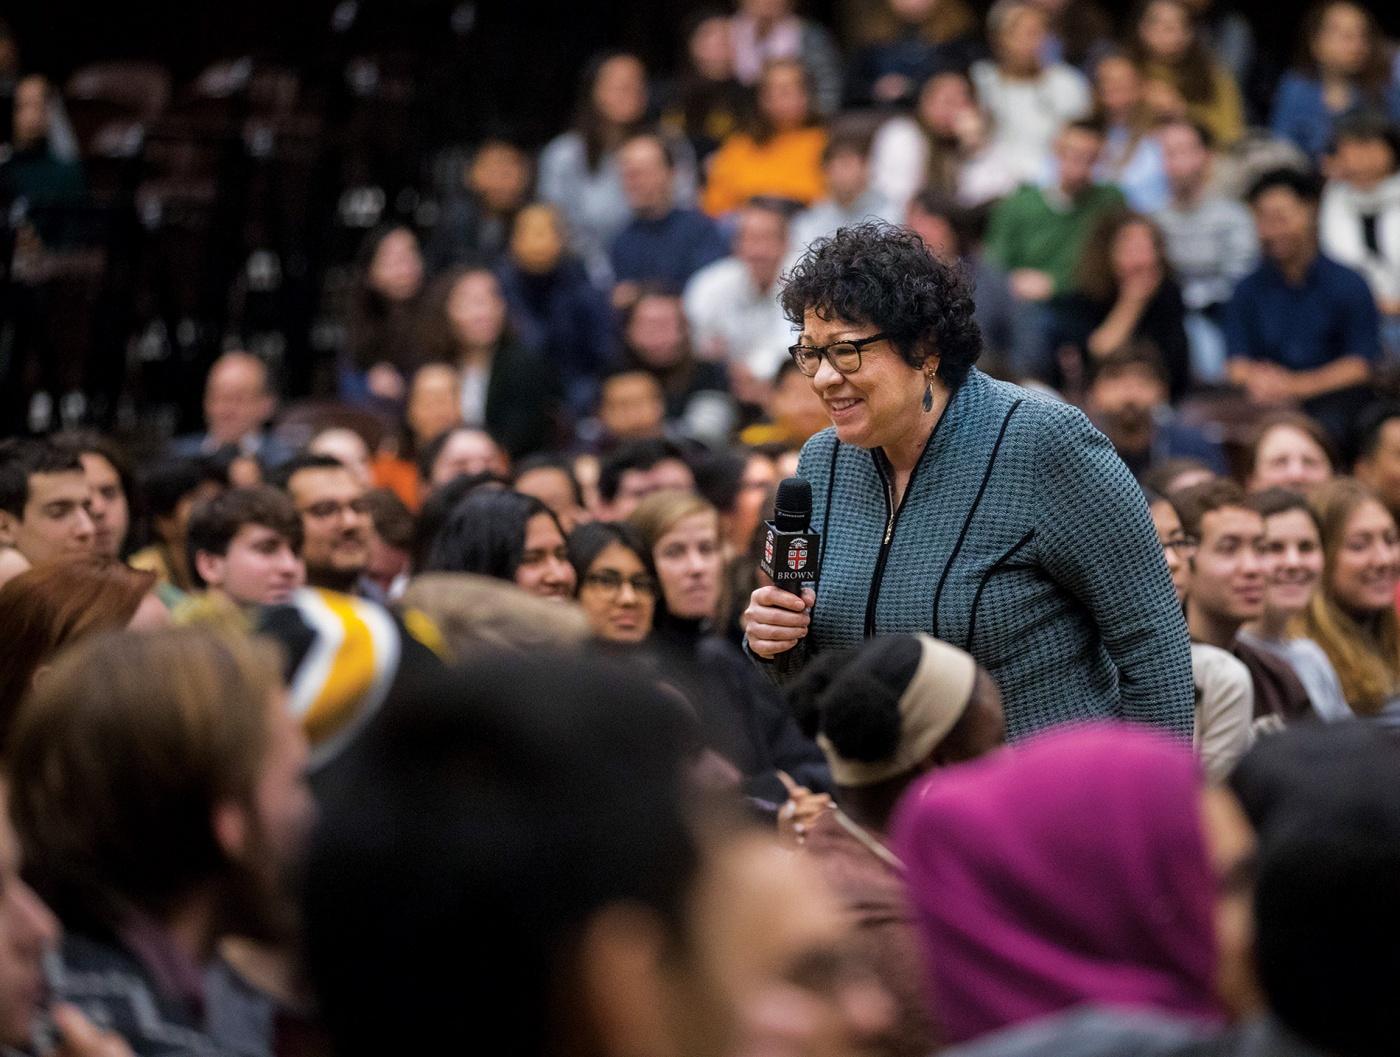 Justice Sonia Sotomayor walking among Brown students